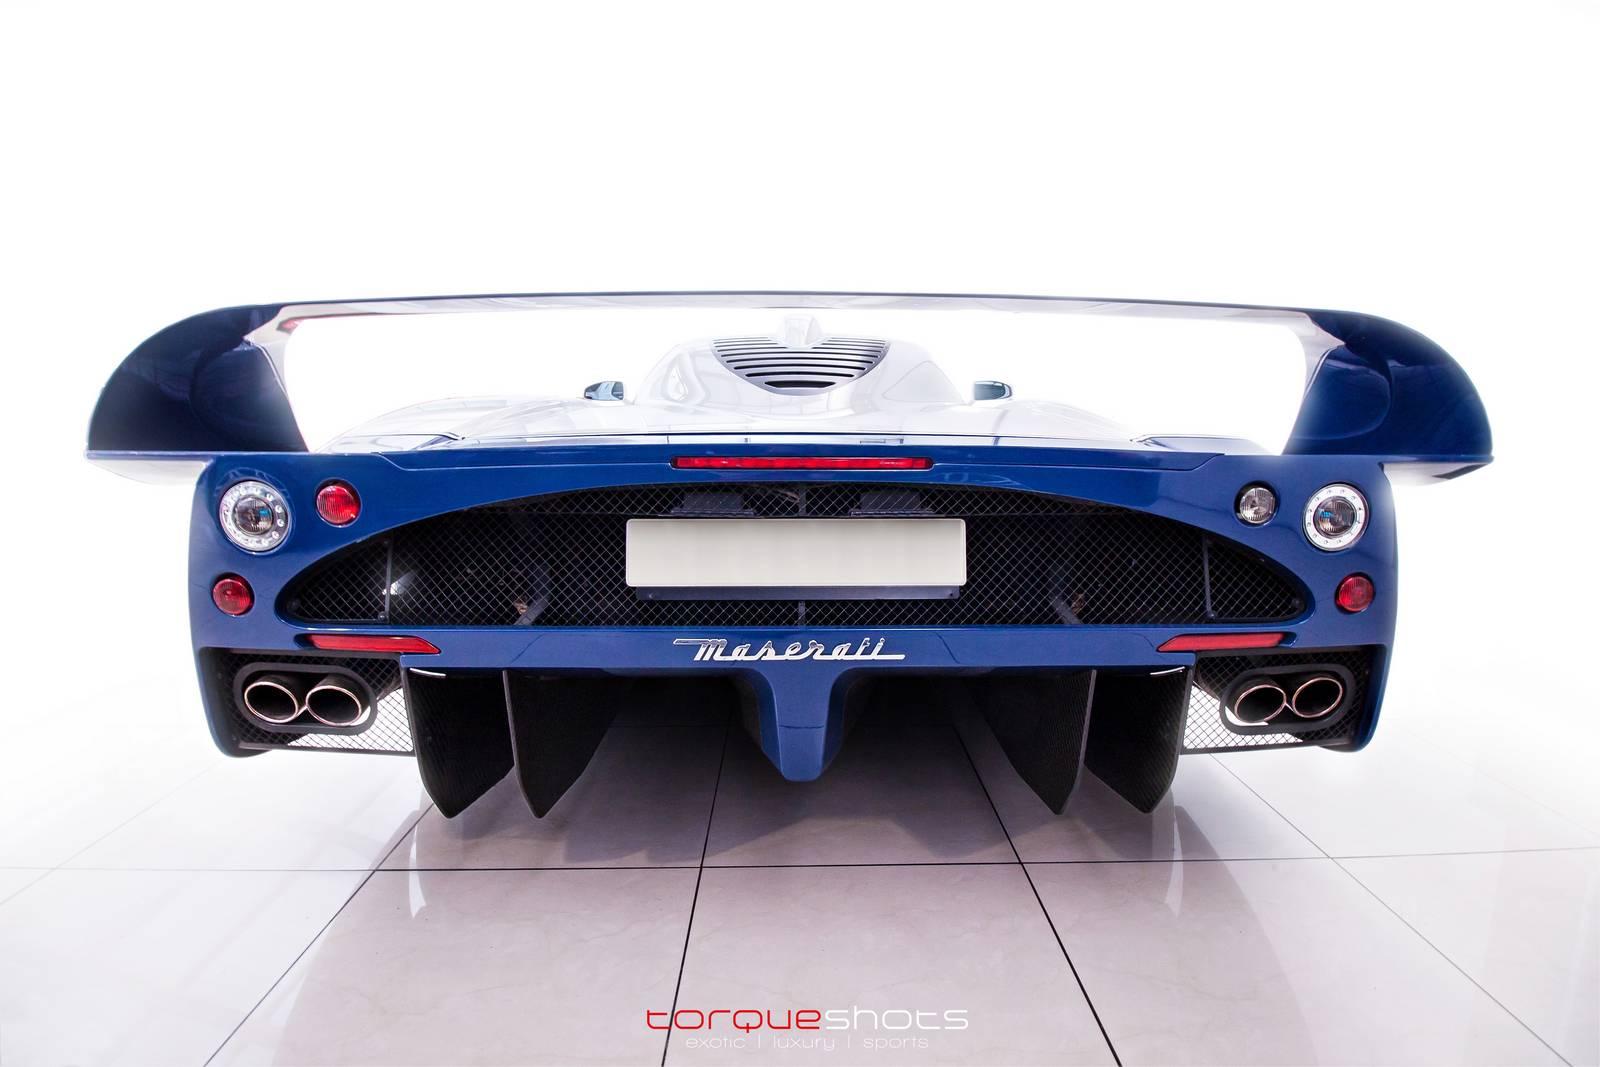 https://storage.googleapis.com/gtspirit/uploads/2015/01/Maserati-MC12-3.jpg